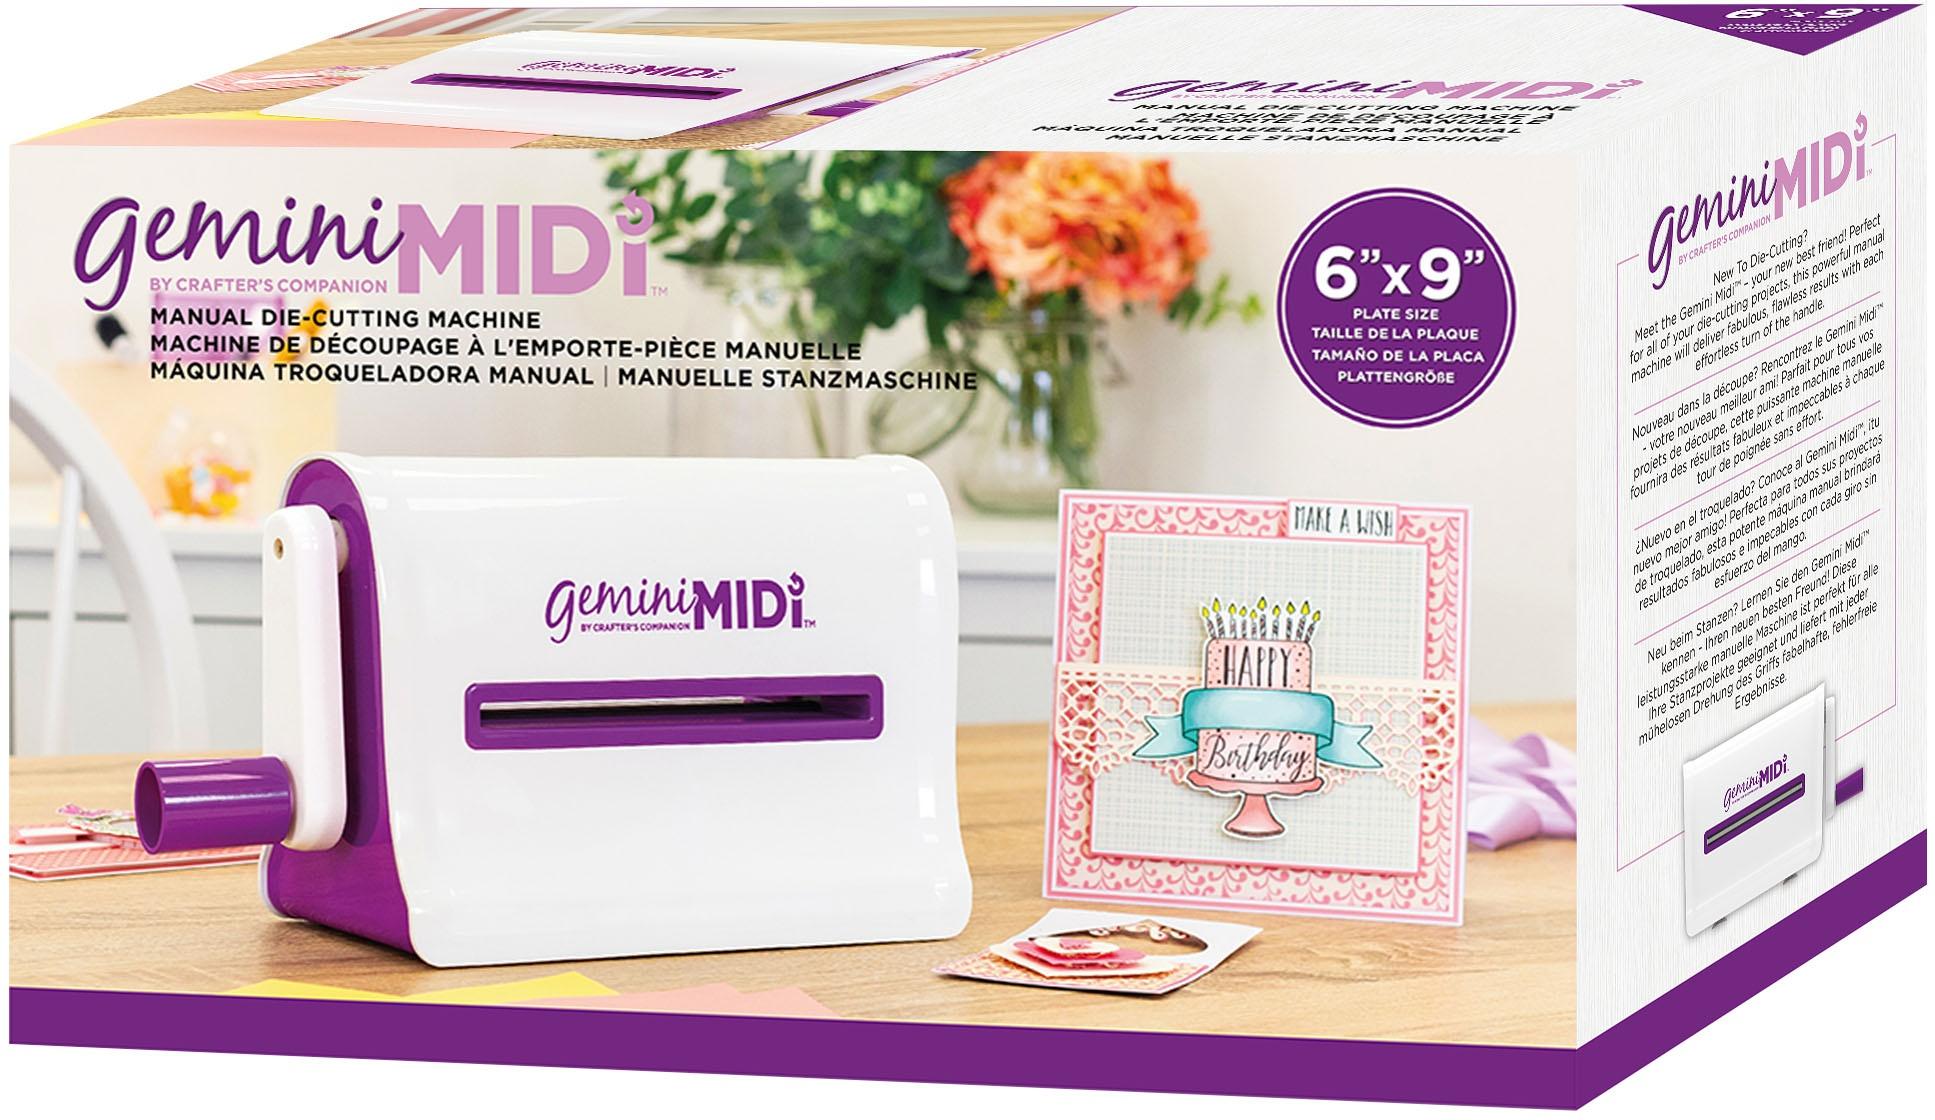 Gemini Midi Manual Die-Cutting & Embossing Machine-